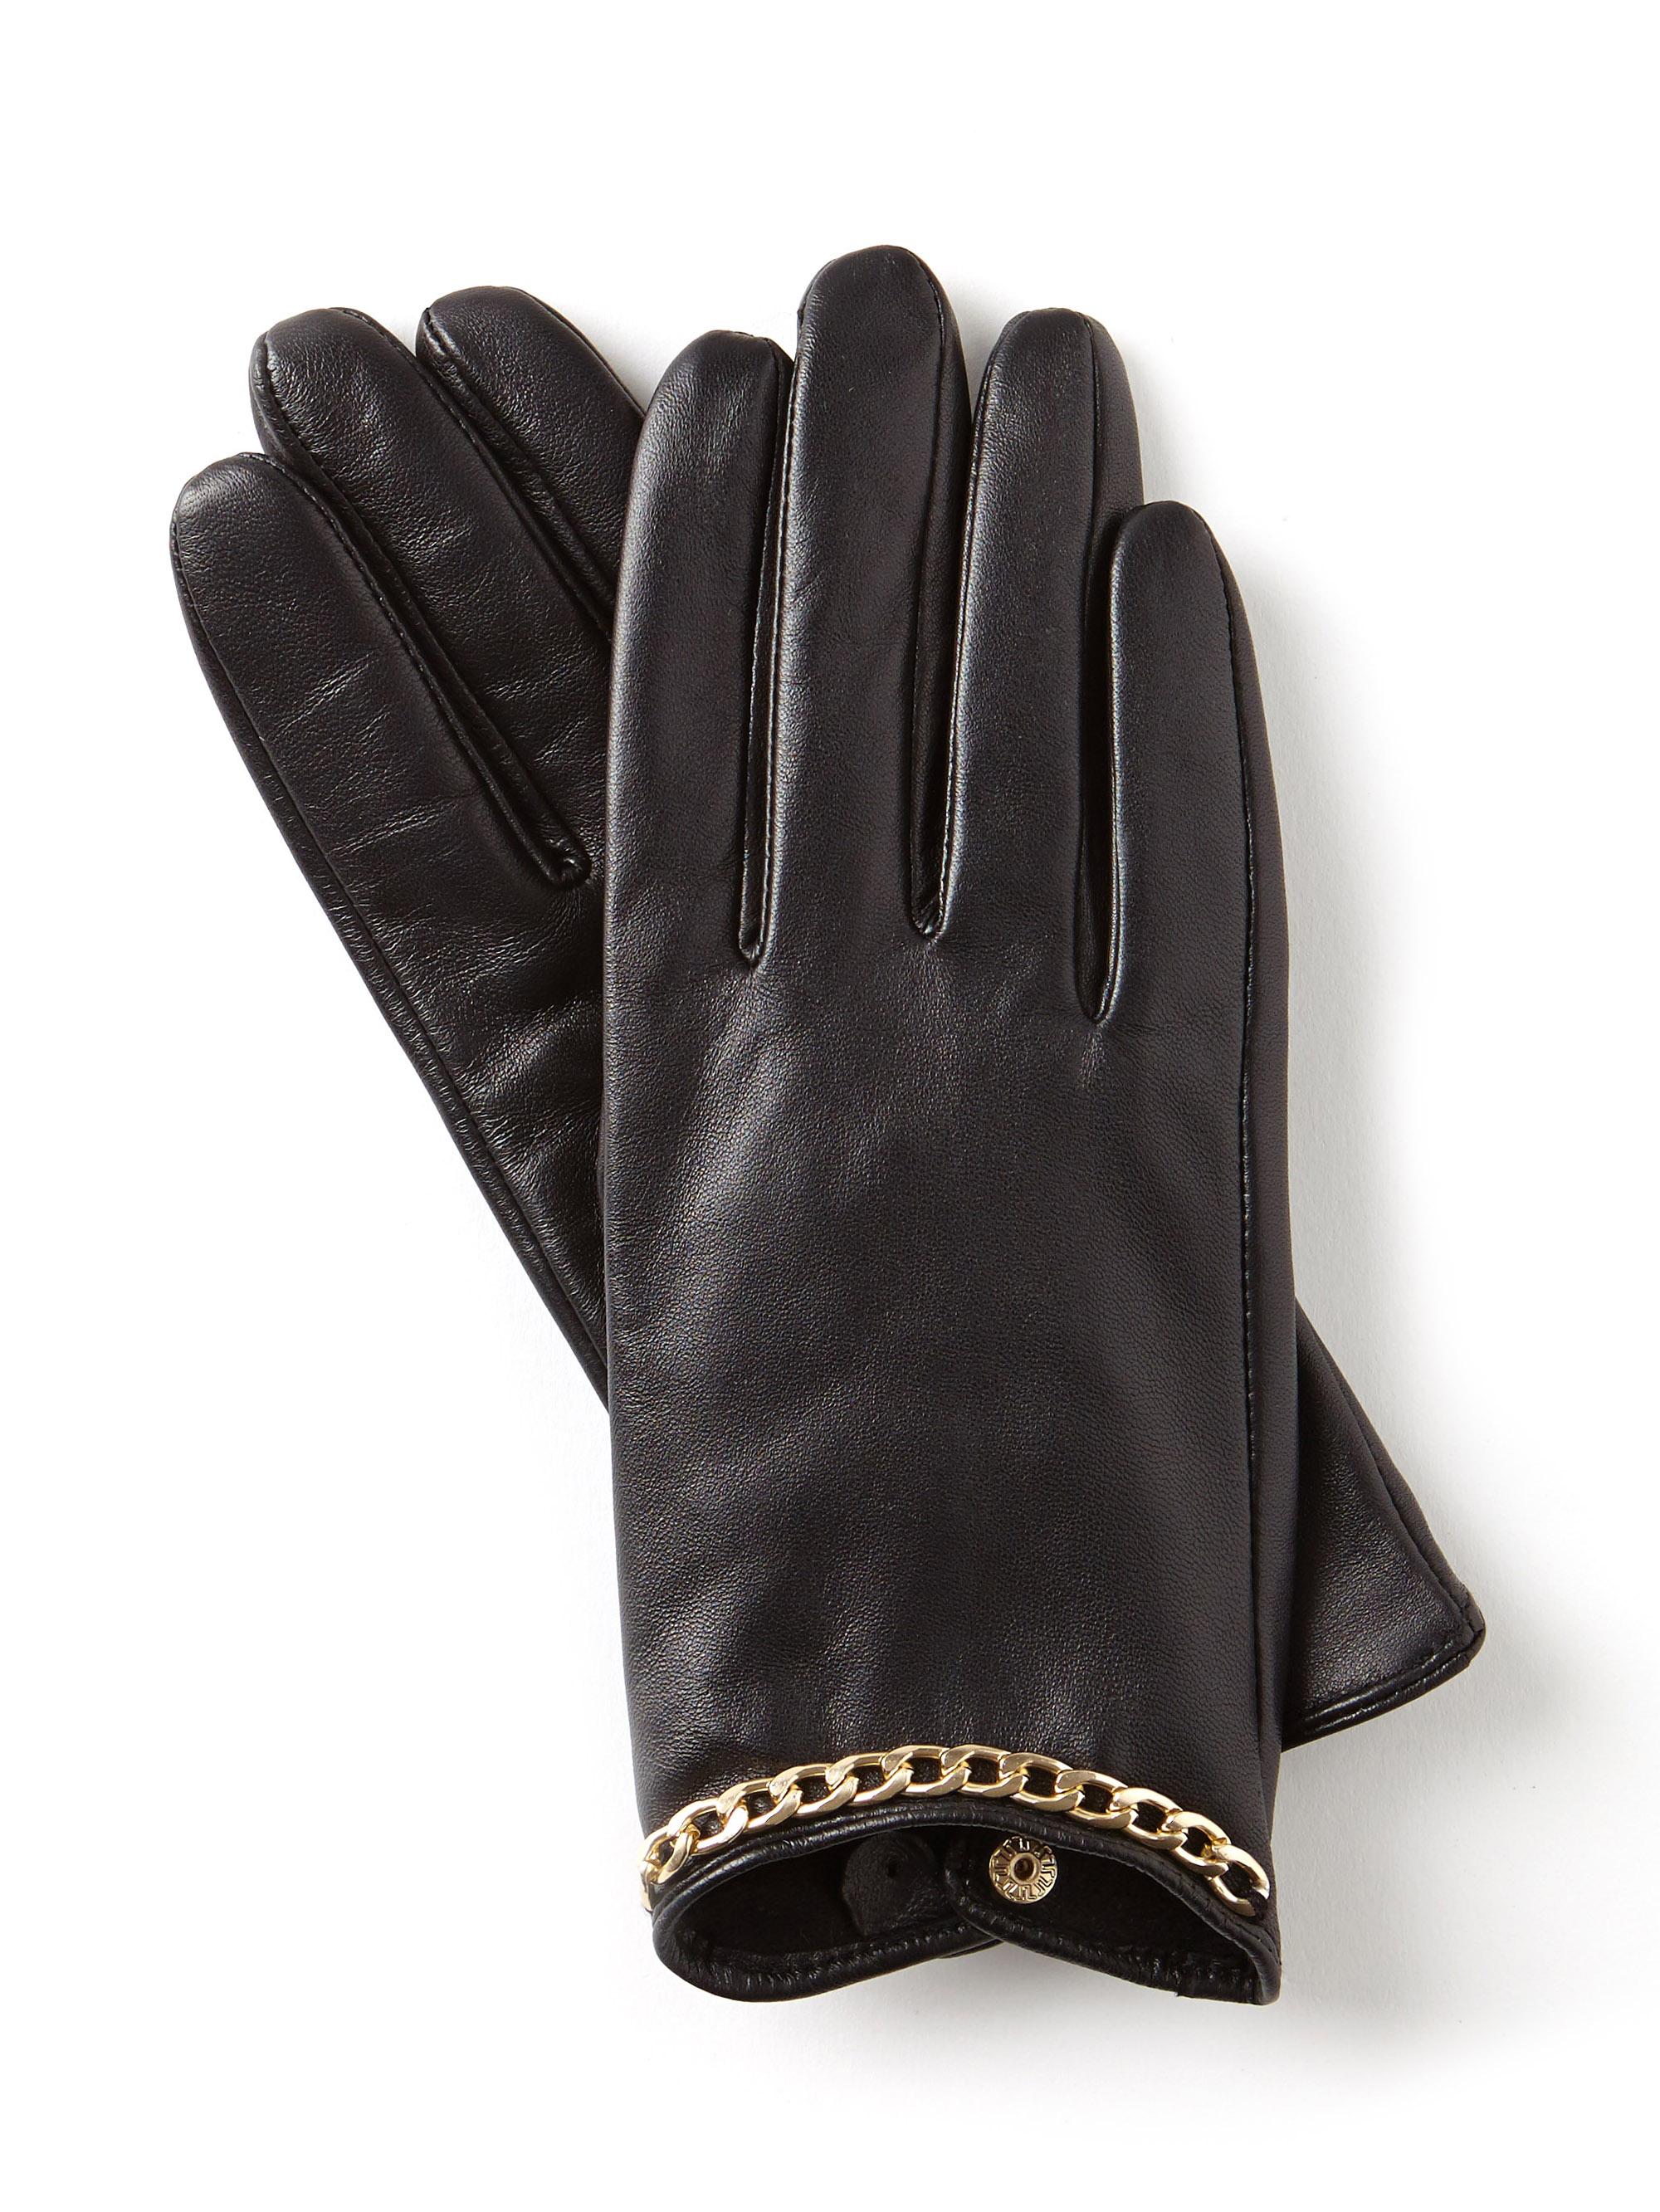 Cache Glove Gift Guide